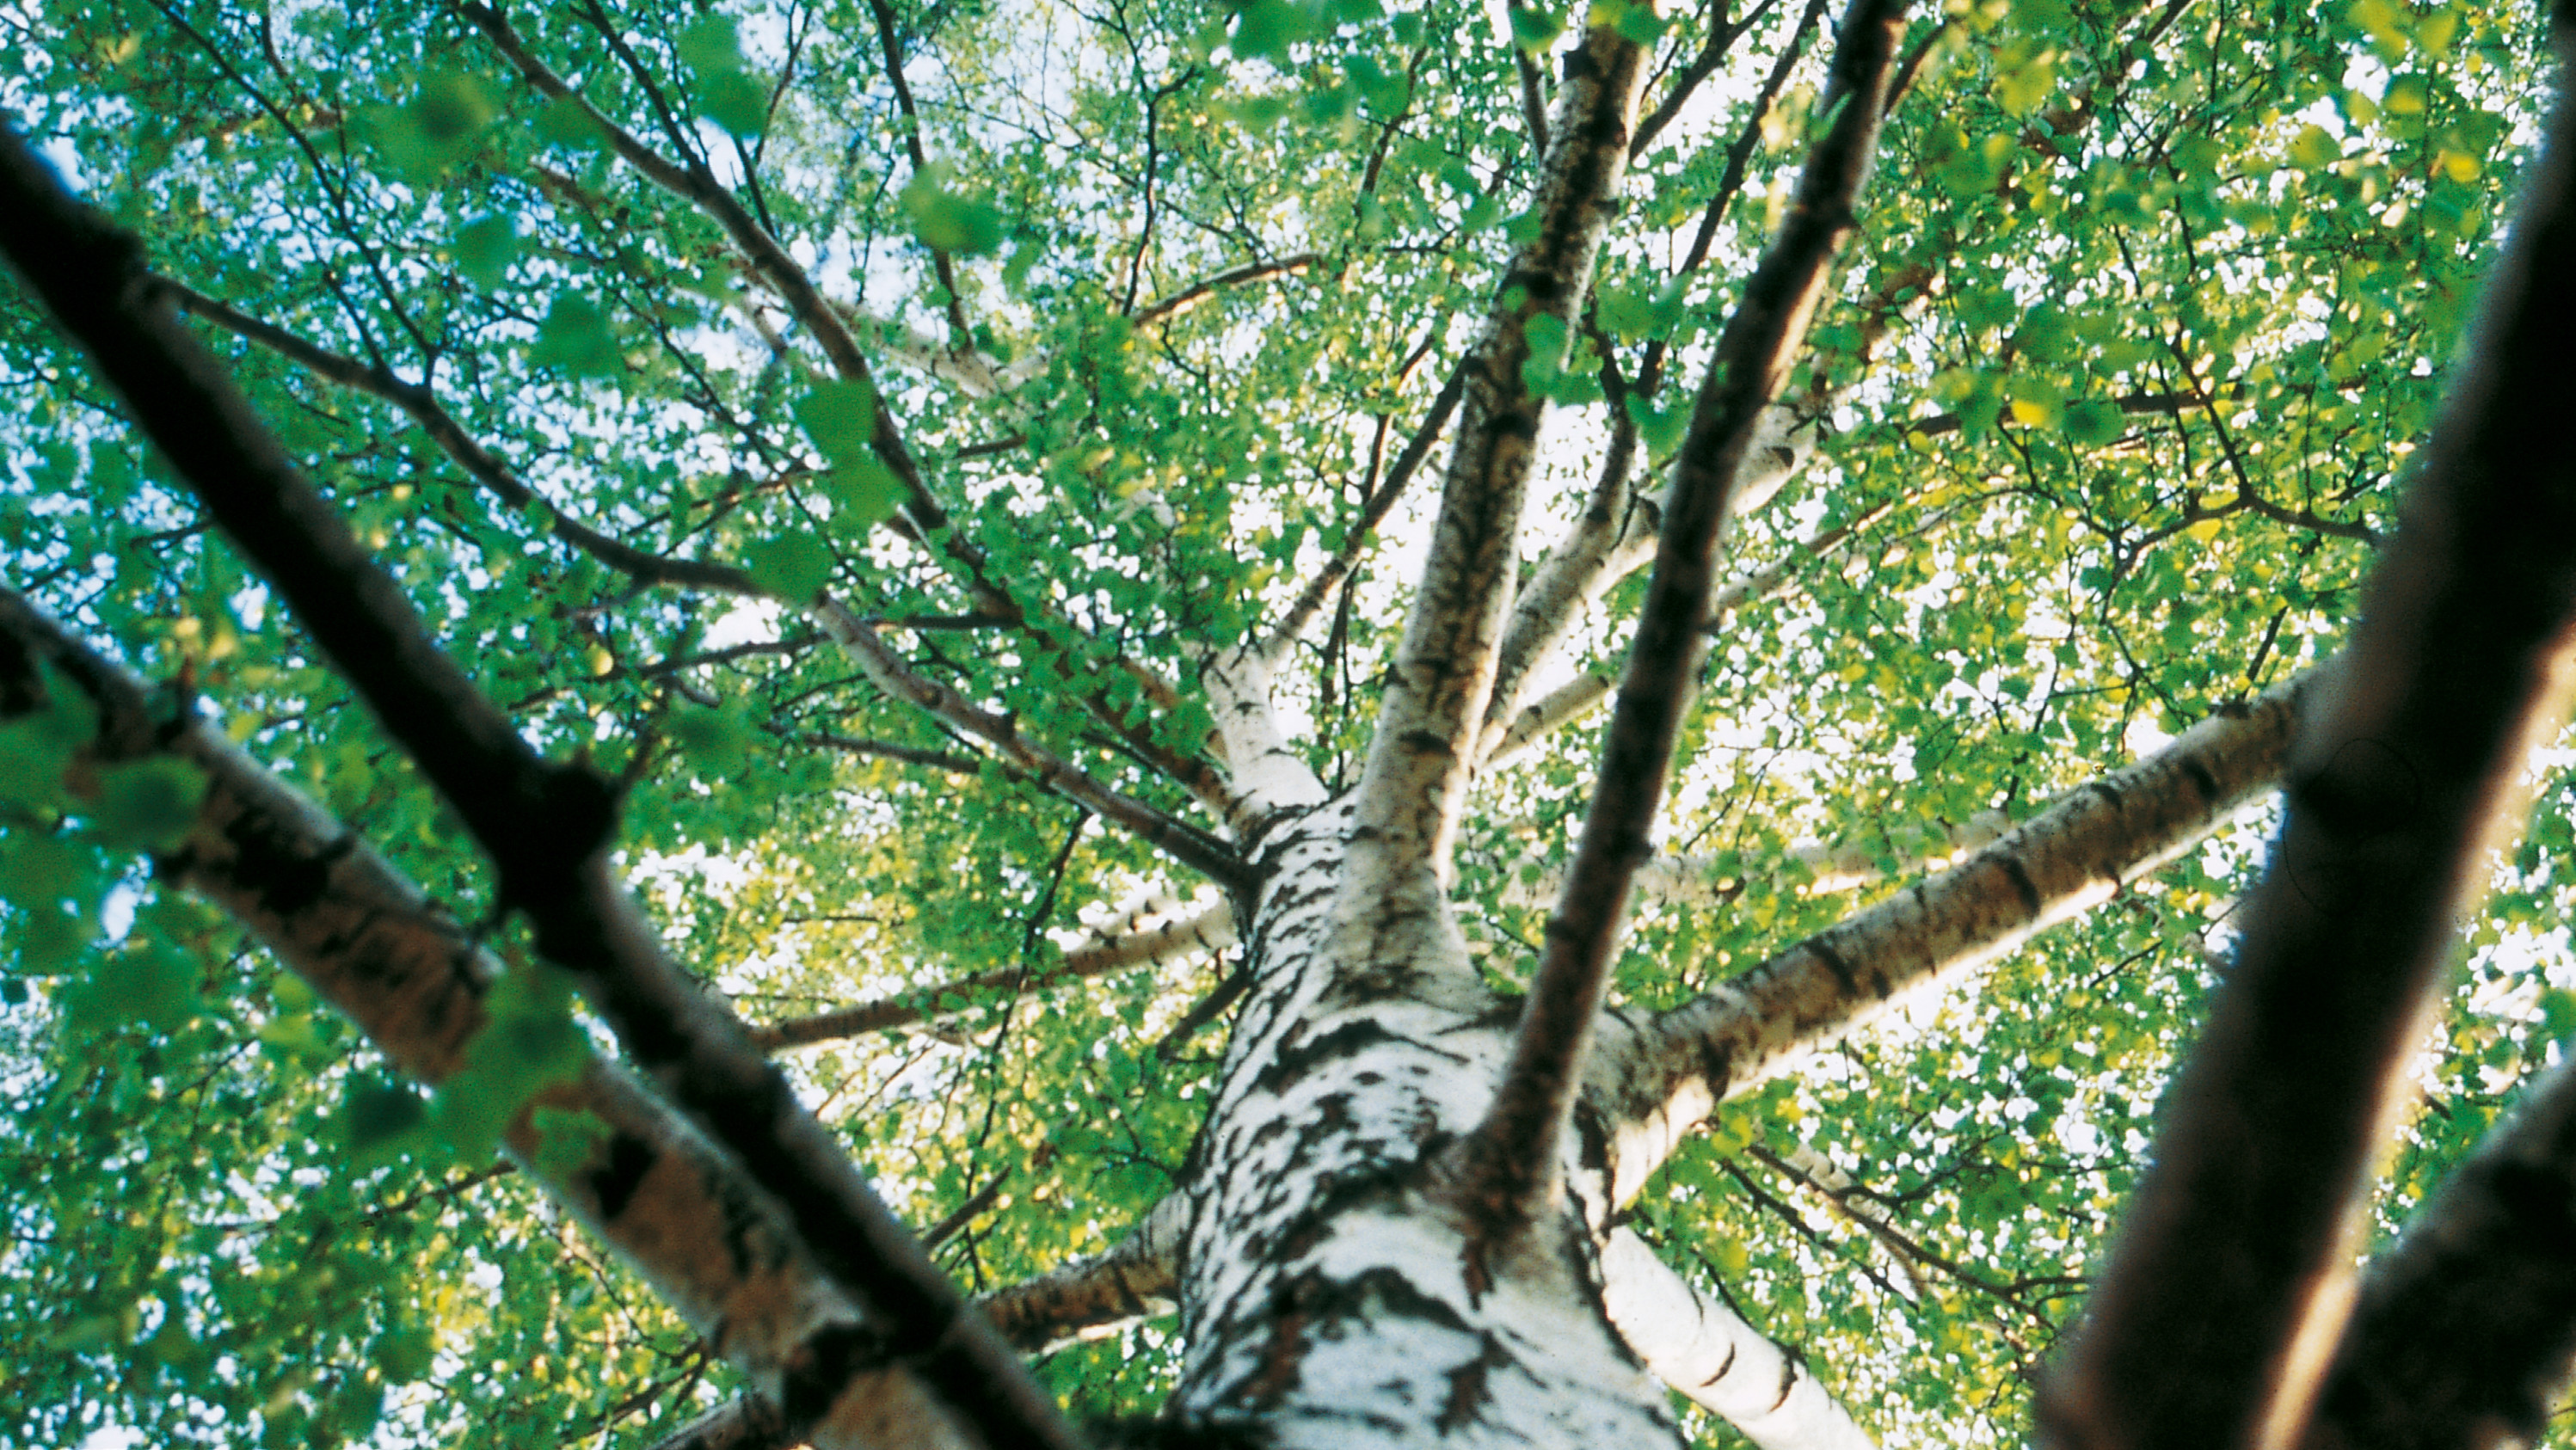 Bäume mit grünen Blättern